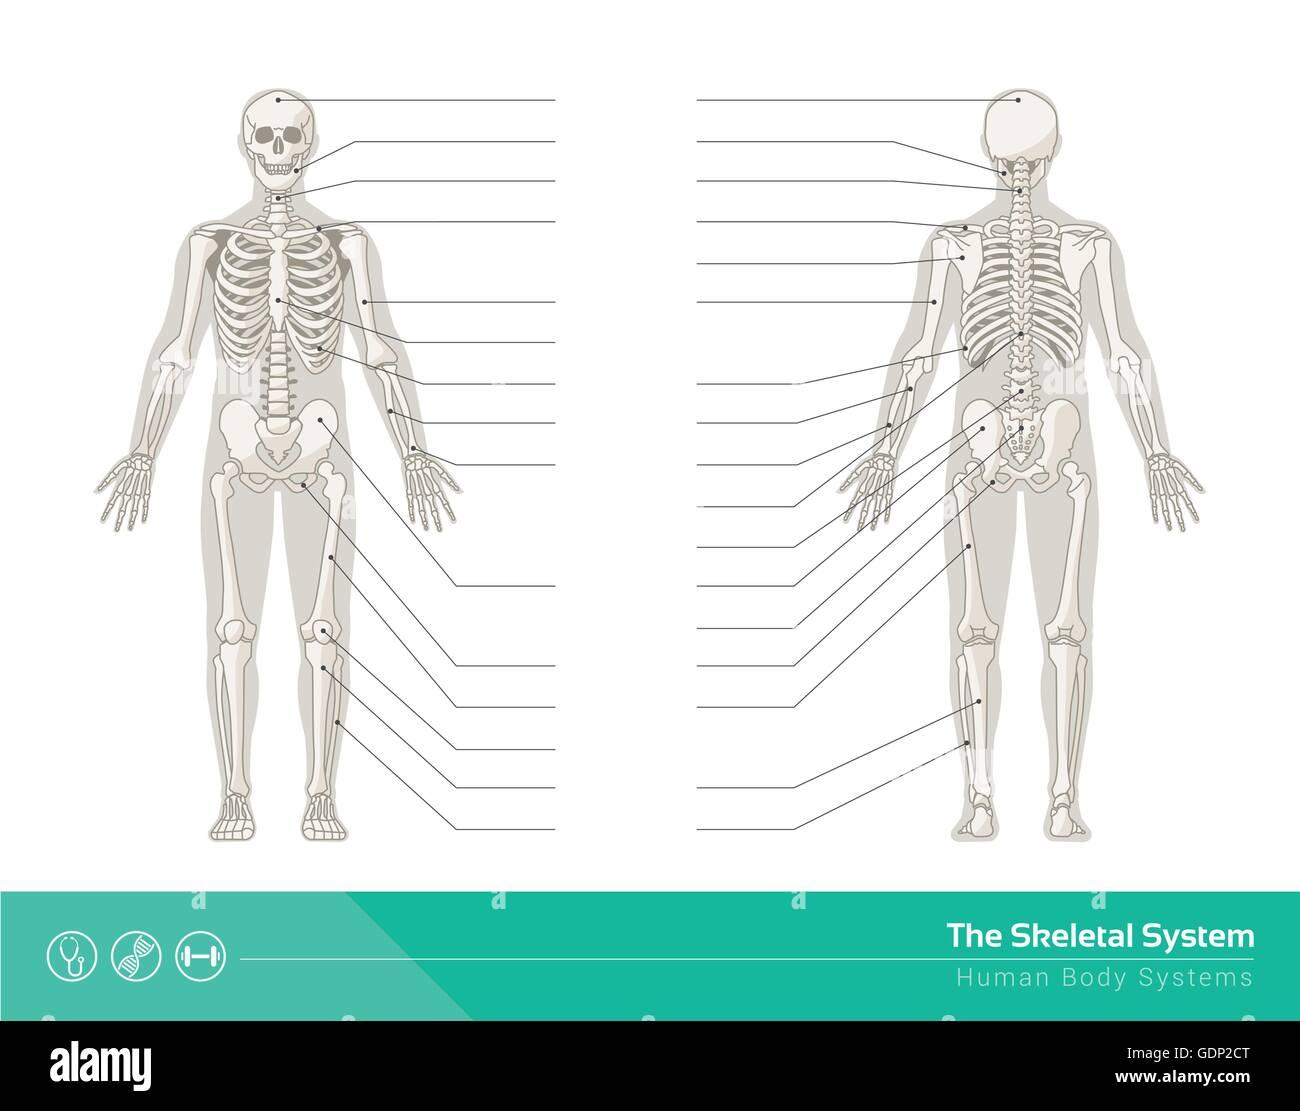 Anatomy Skeletal System Stock Photos Anatomy Skeletal System Stock